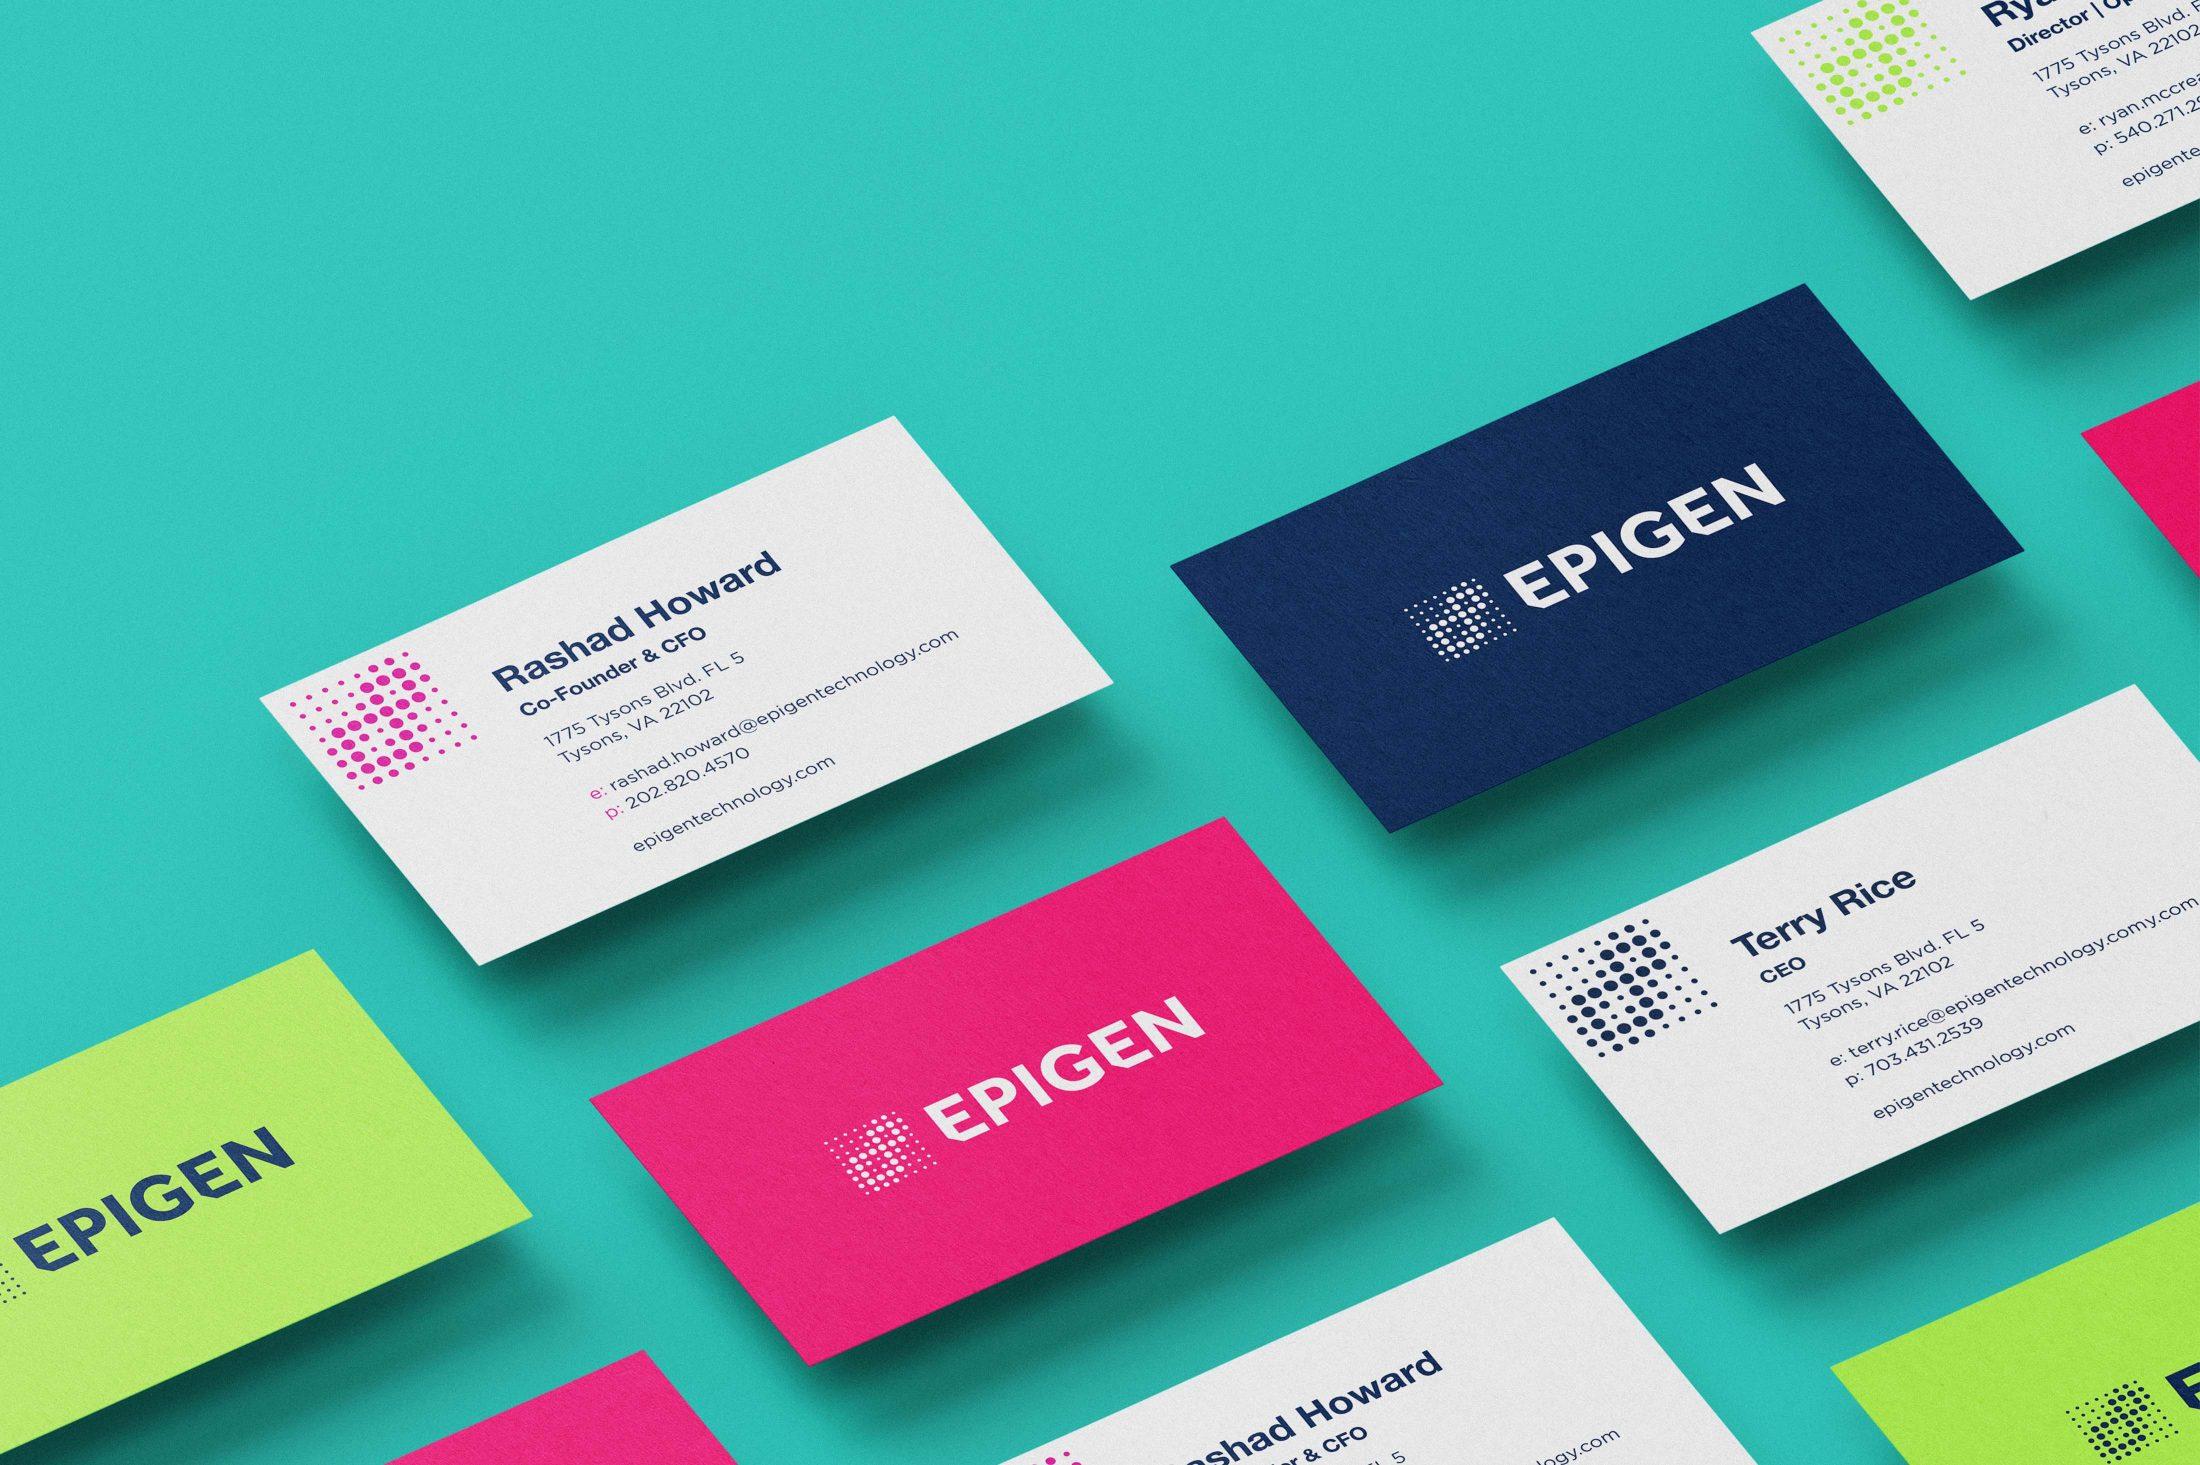 Epigen business cards